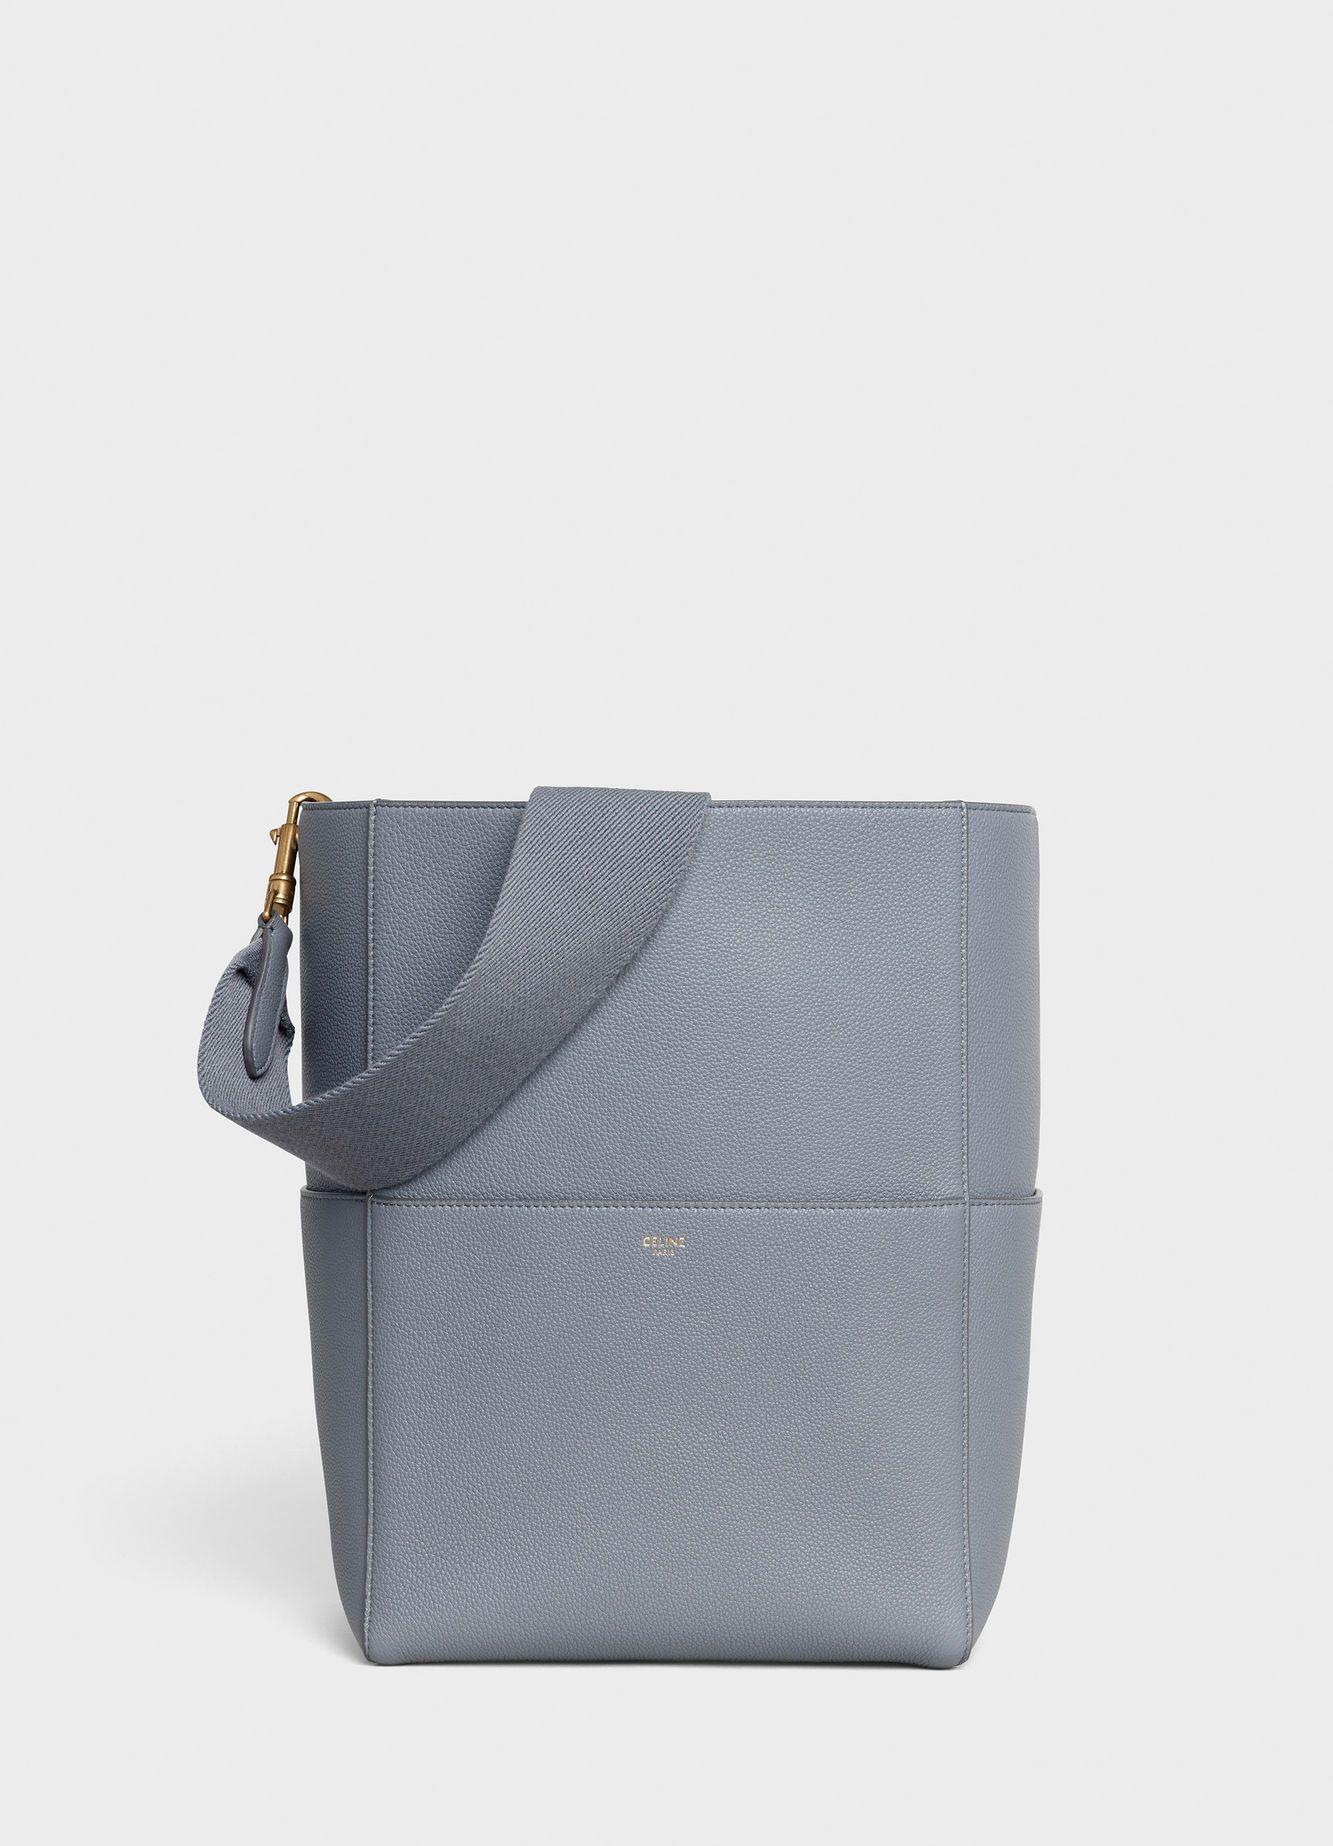 1445cc4bf1dd Sangle bucket bag in soft grained calfskin